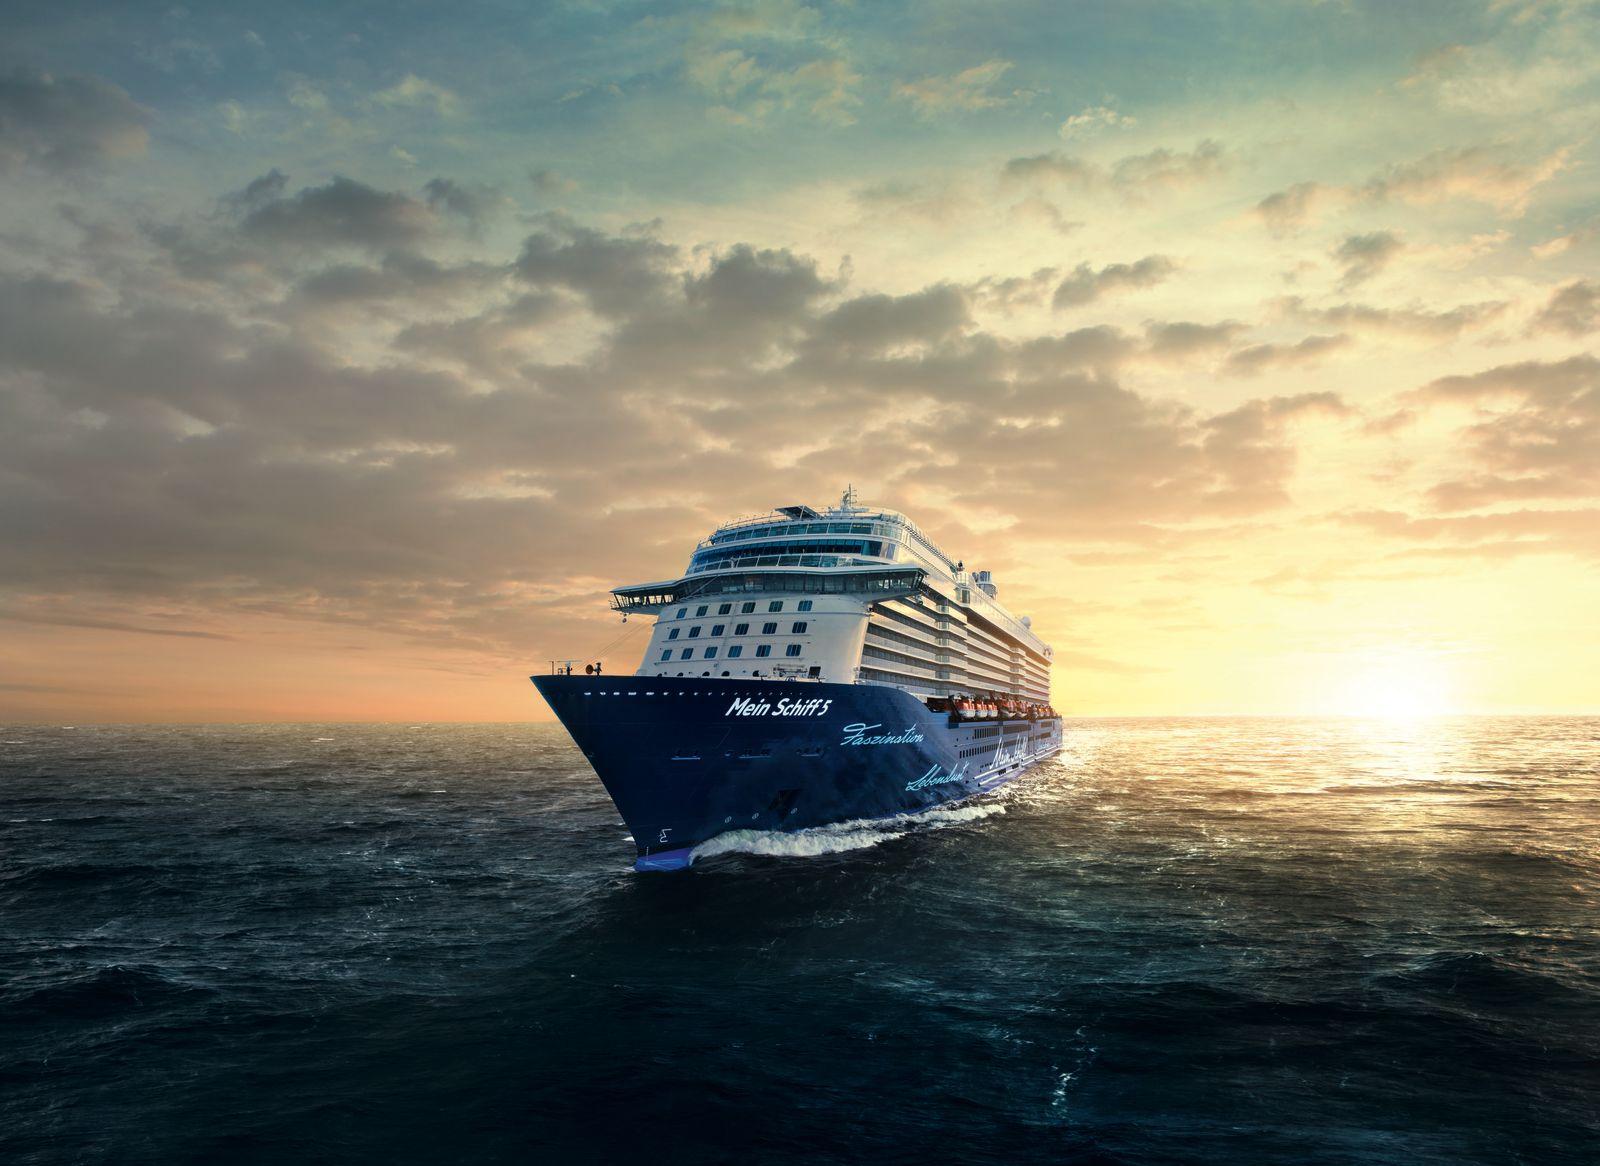 TUI Cruises, mein schiff